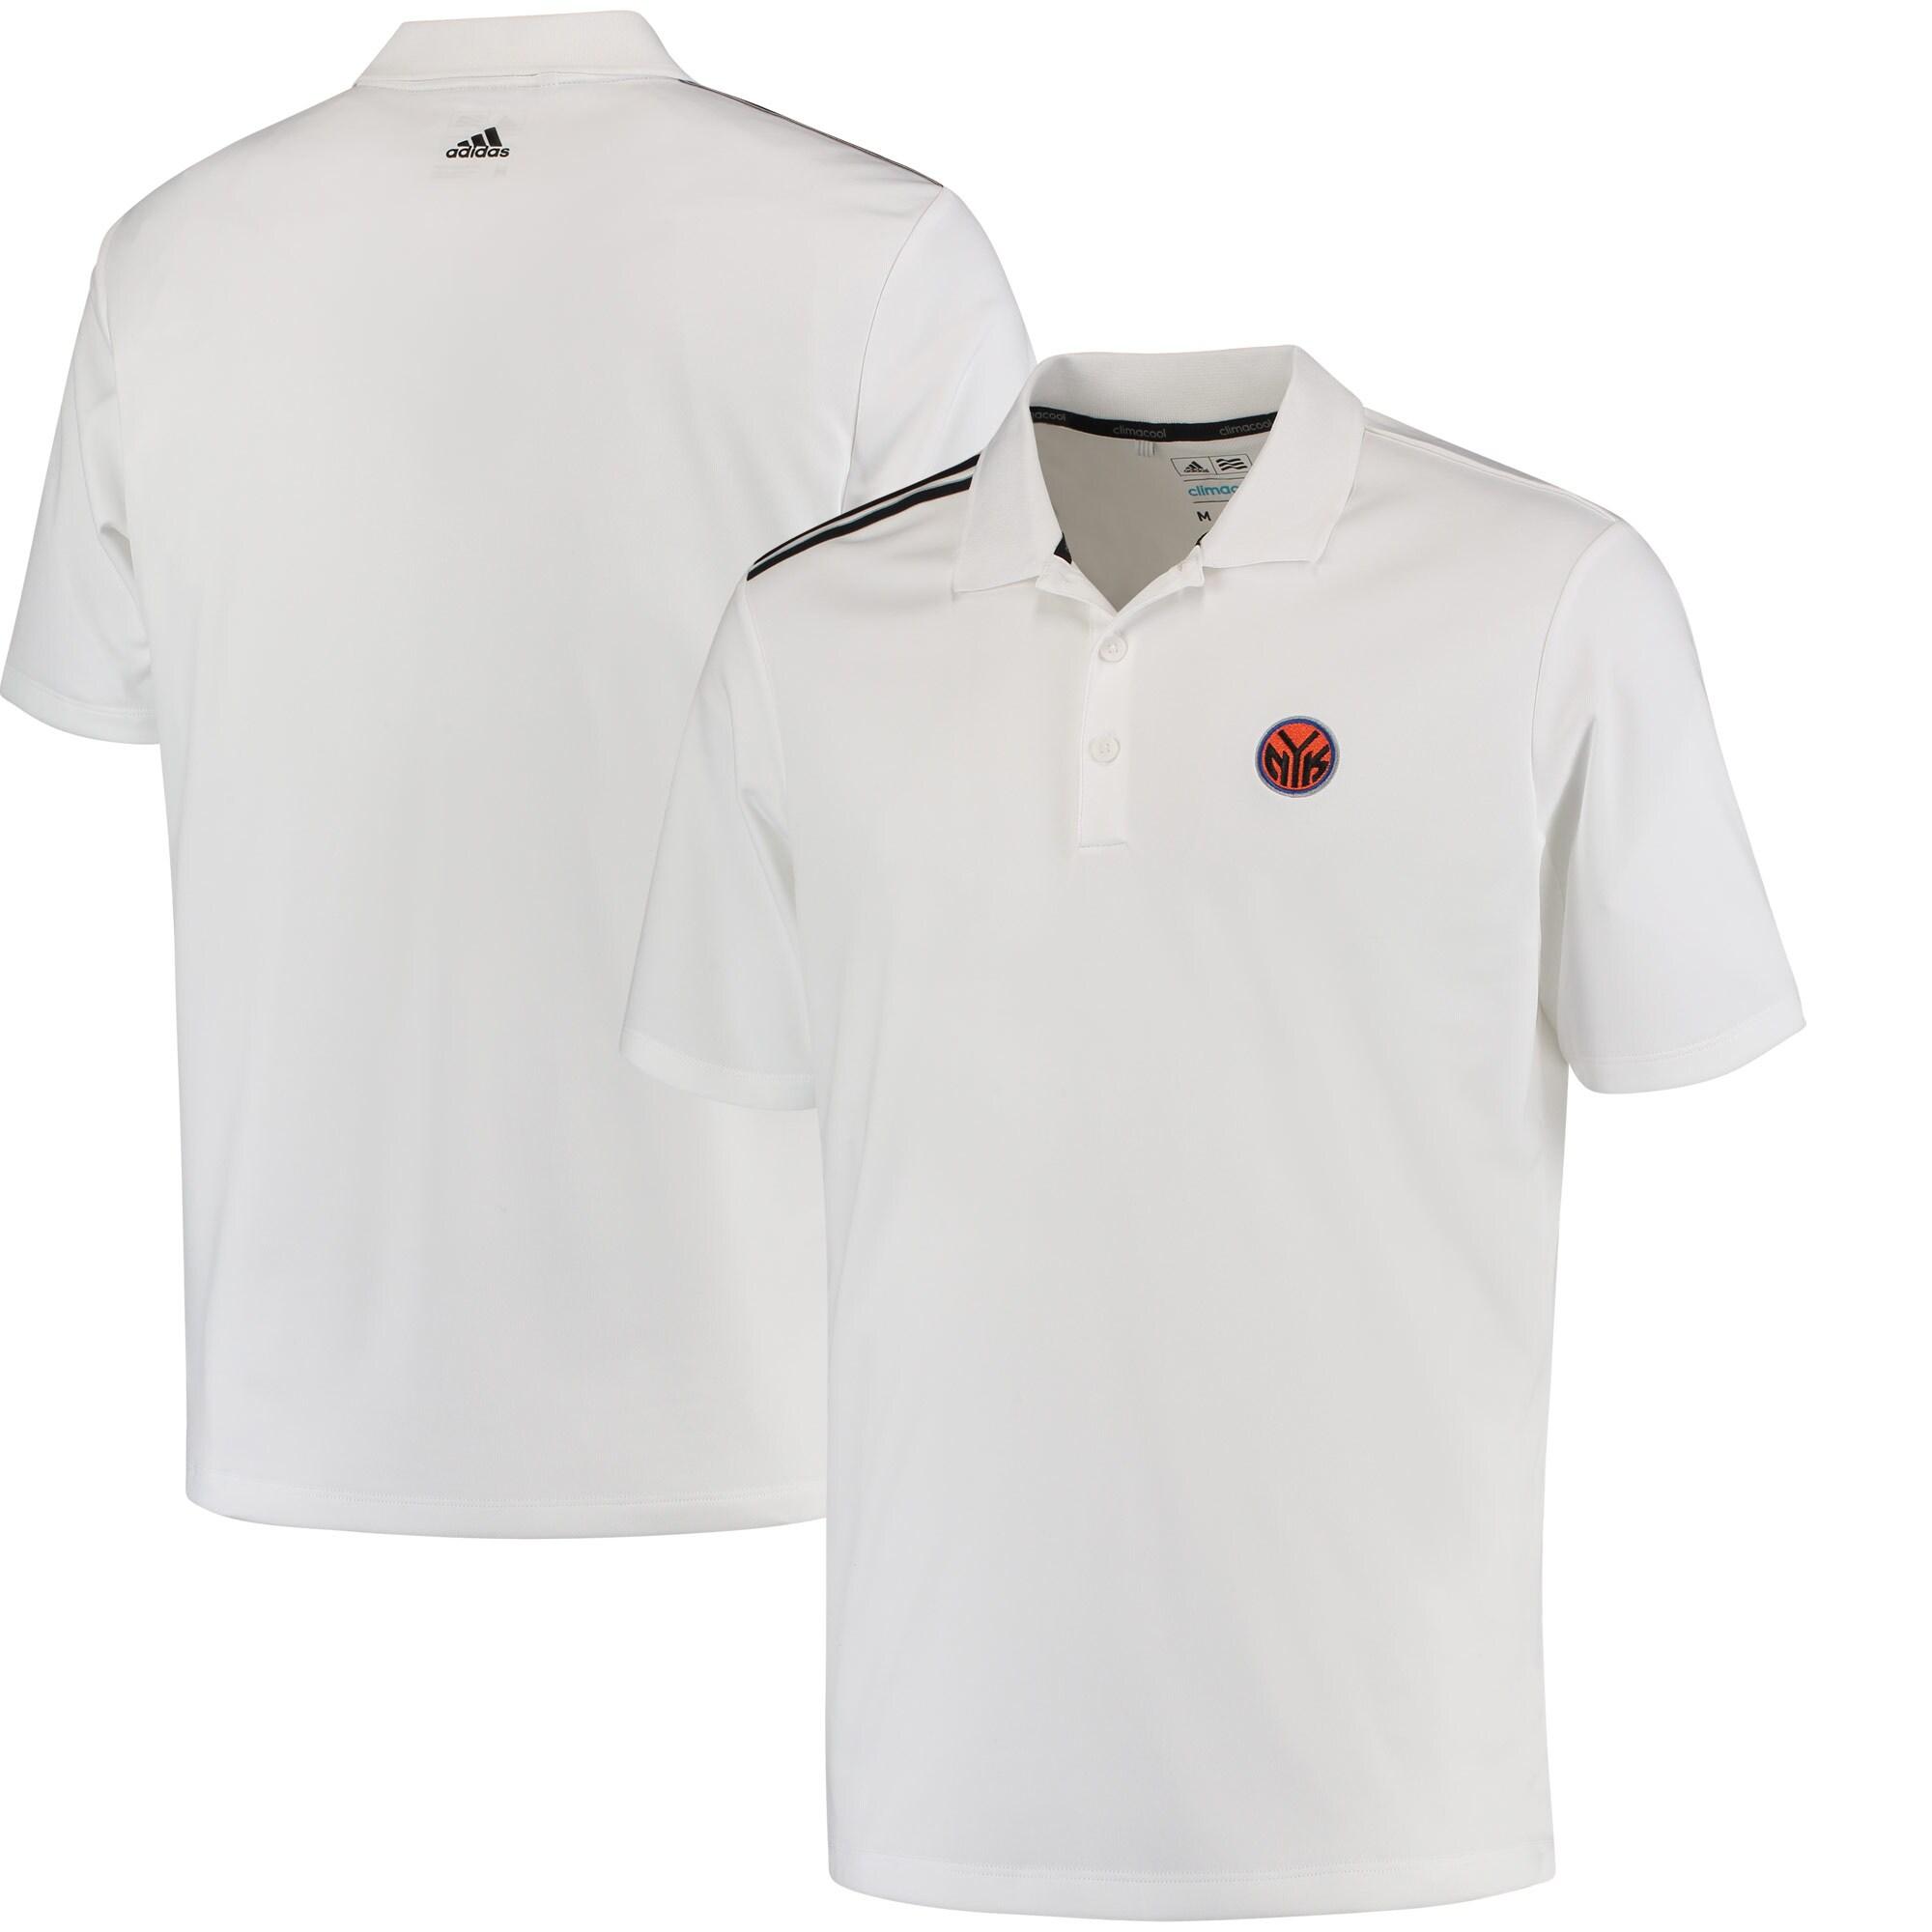 New York Knicks adidas 3-Stripes climacool Polo - White